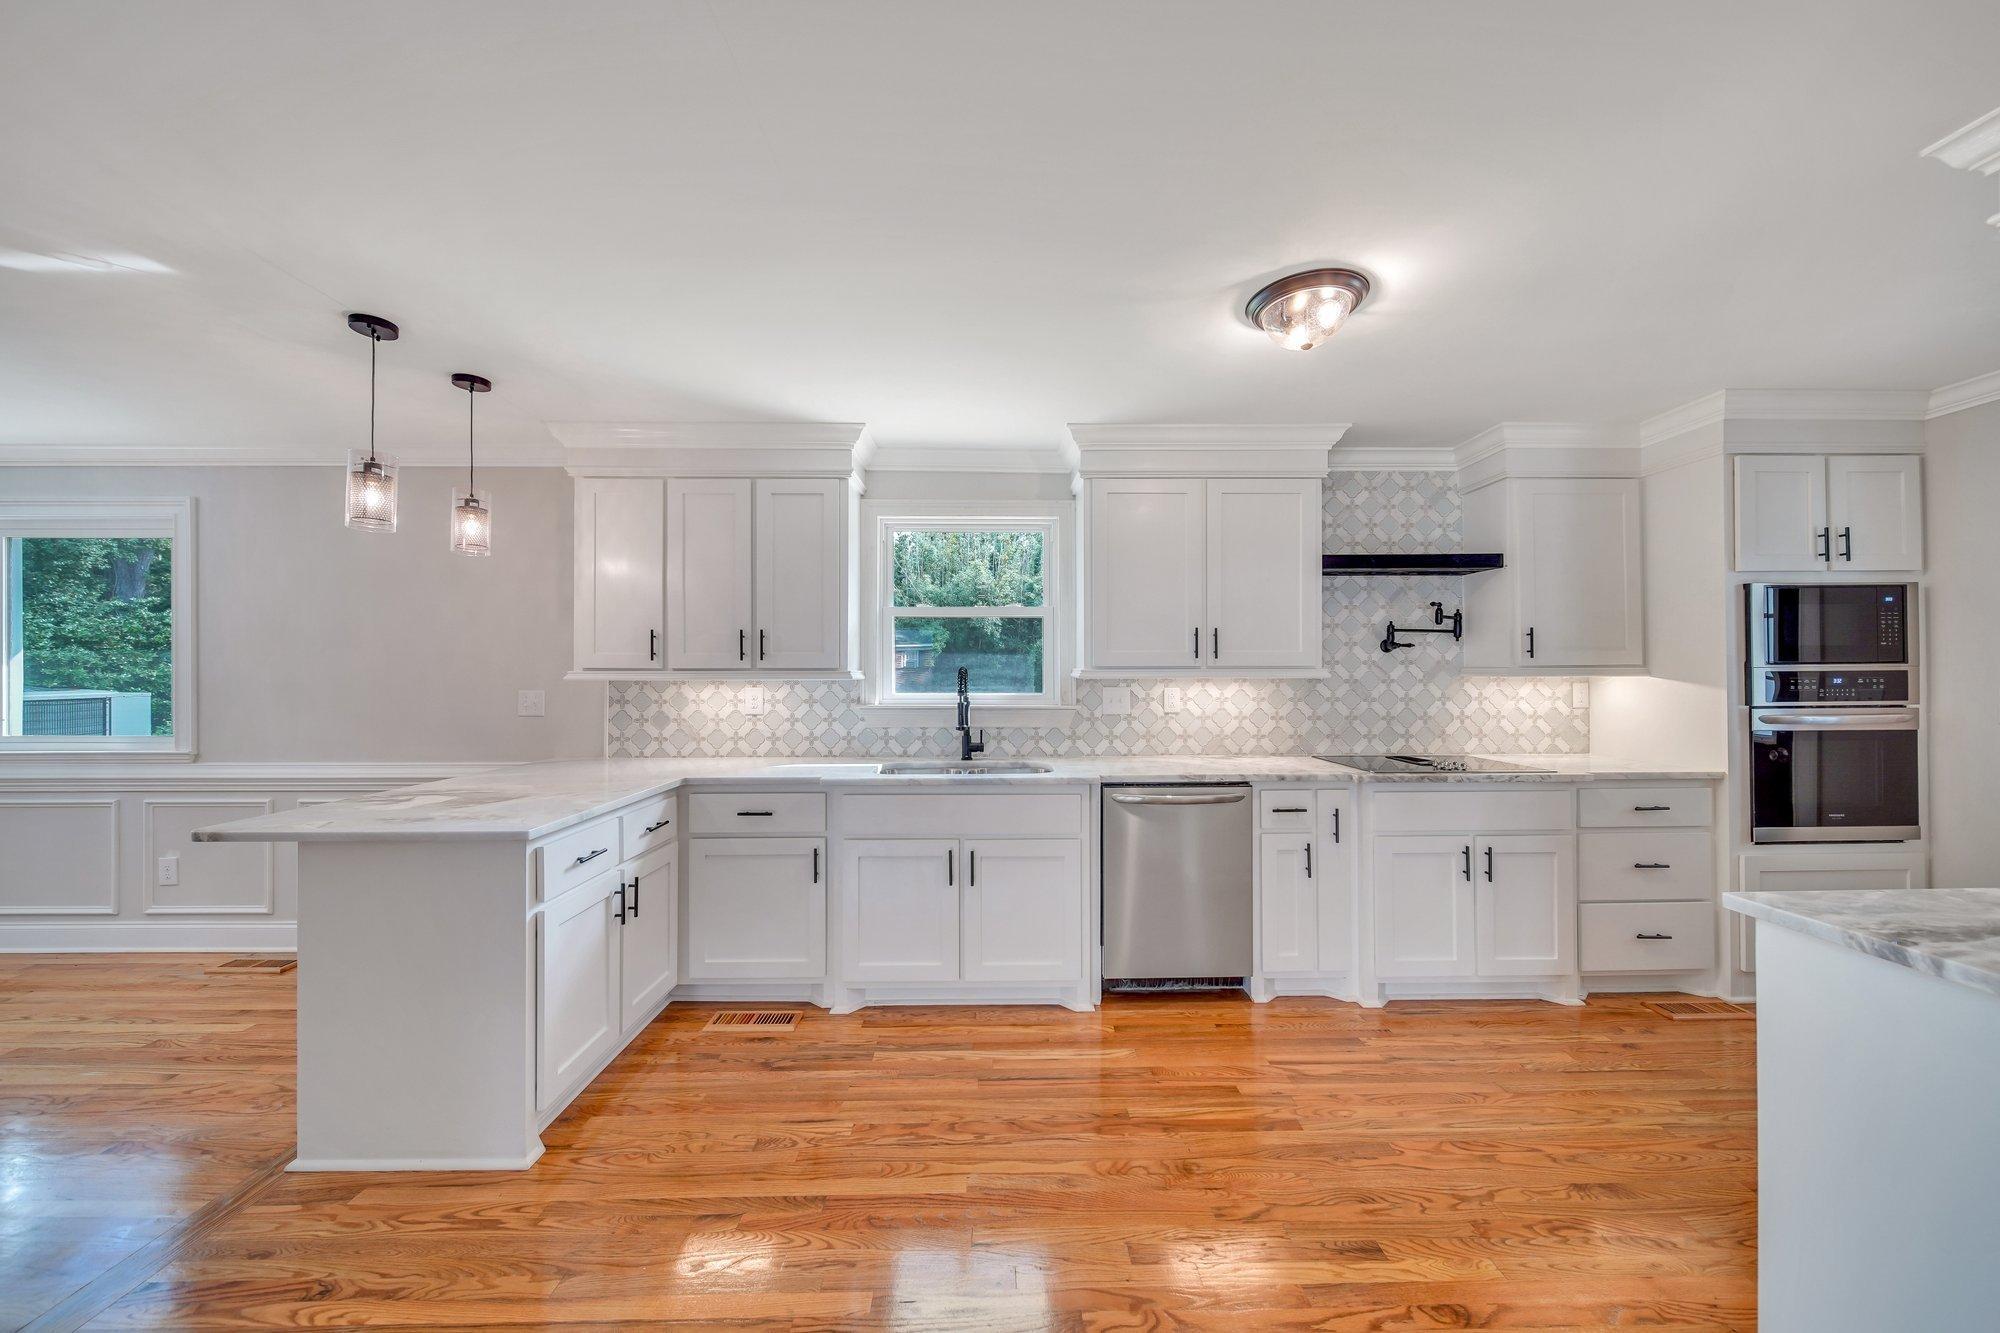 Country Club II Homes For Sale - 1477 Burningtree, Charleston, SC - 32